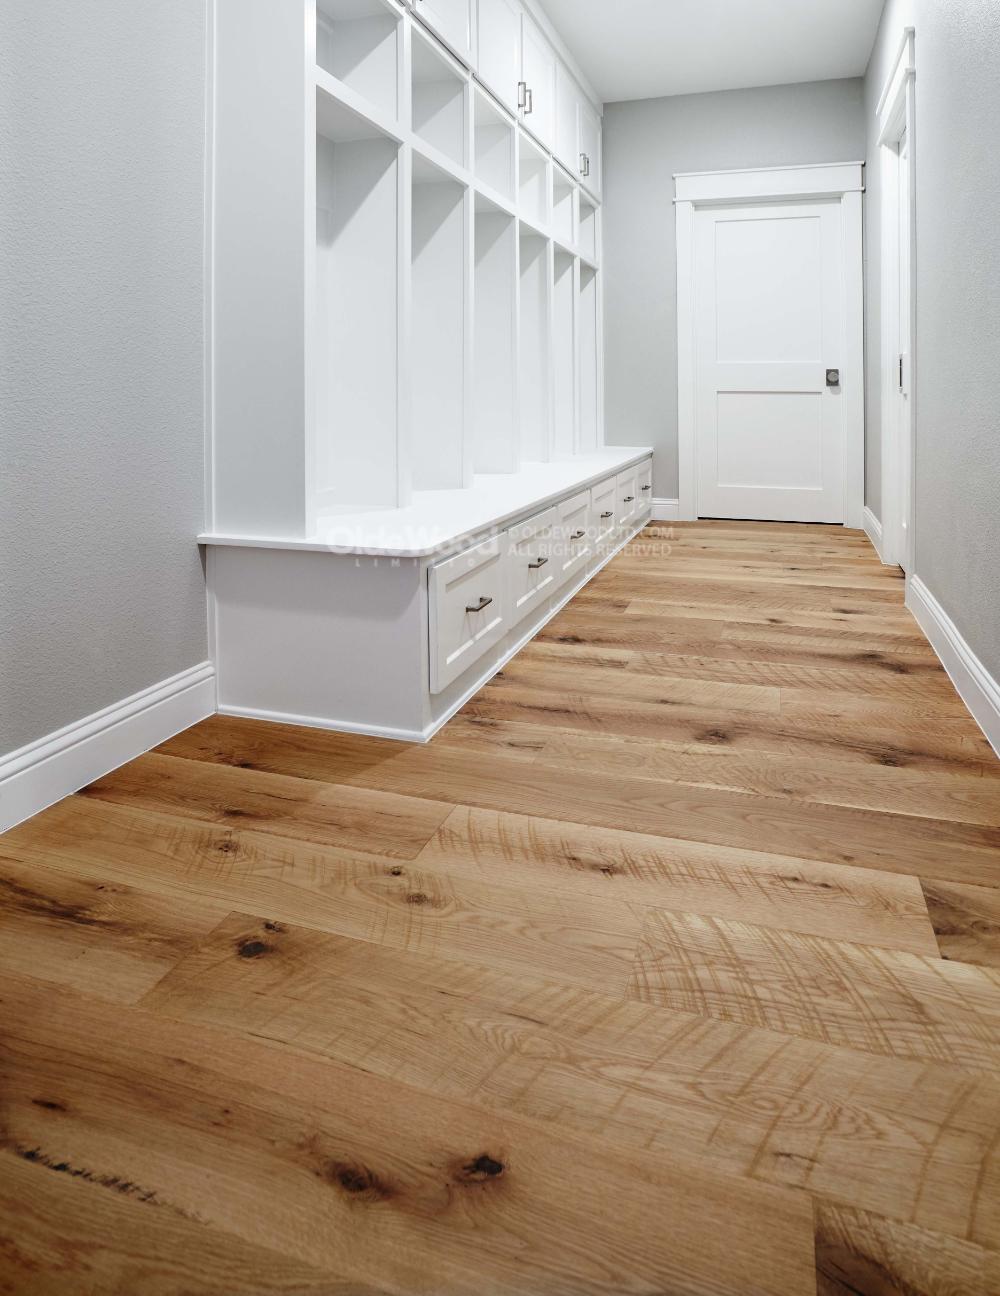 Rustic Mountain Oak Plank Flooring (With images) Oak